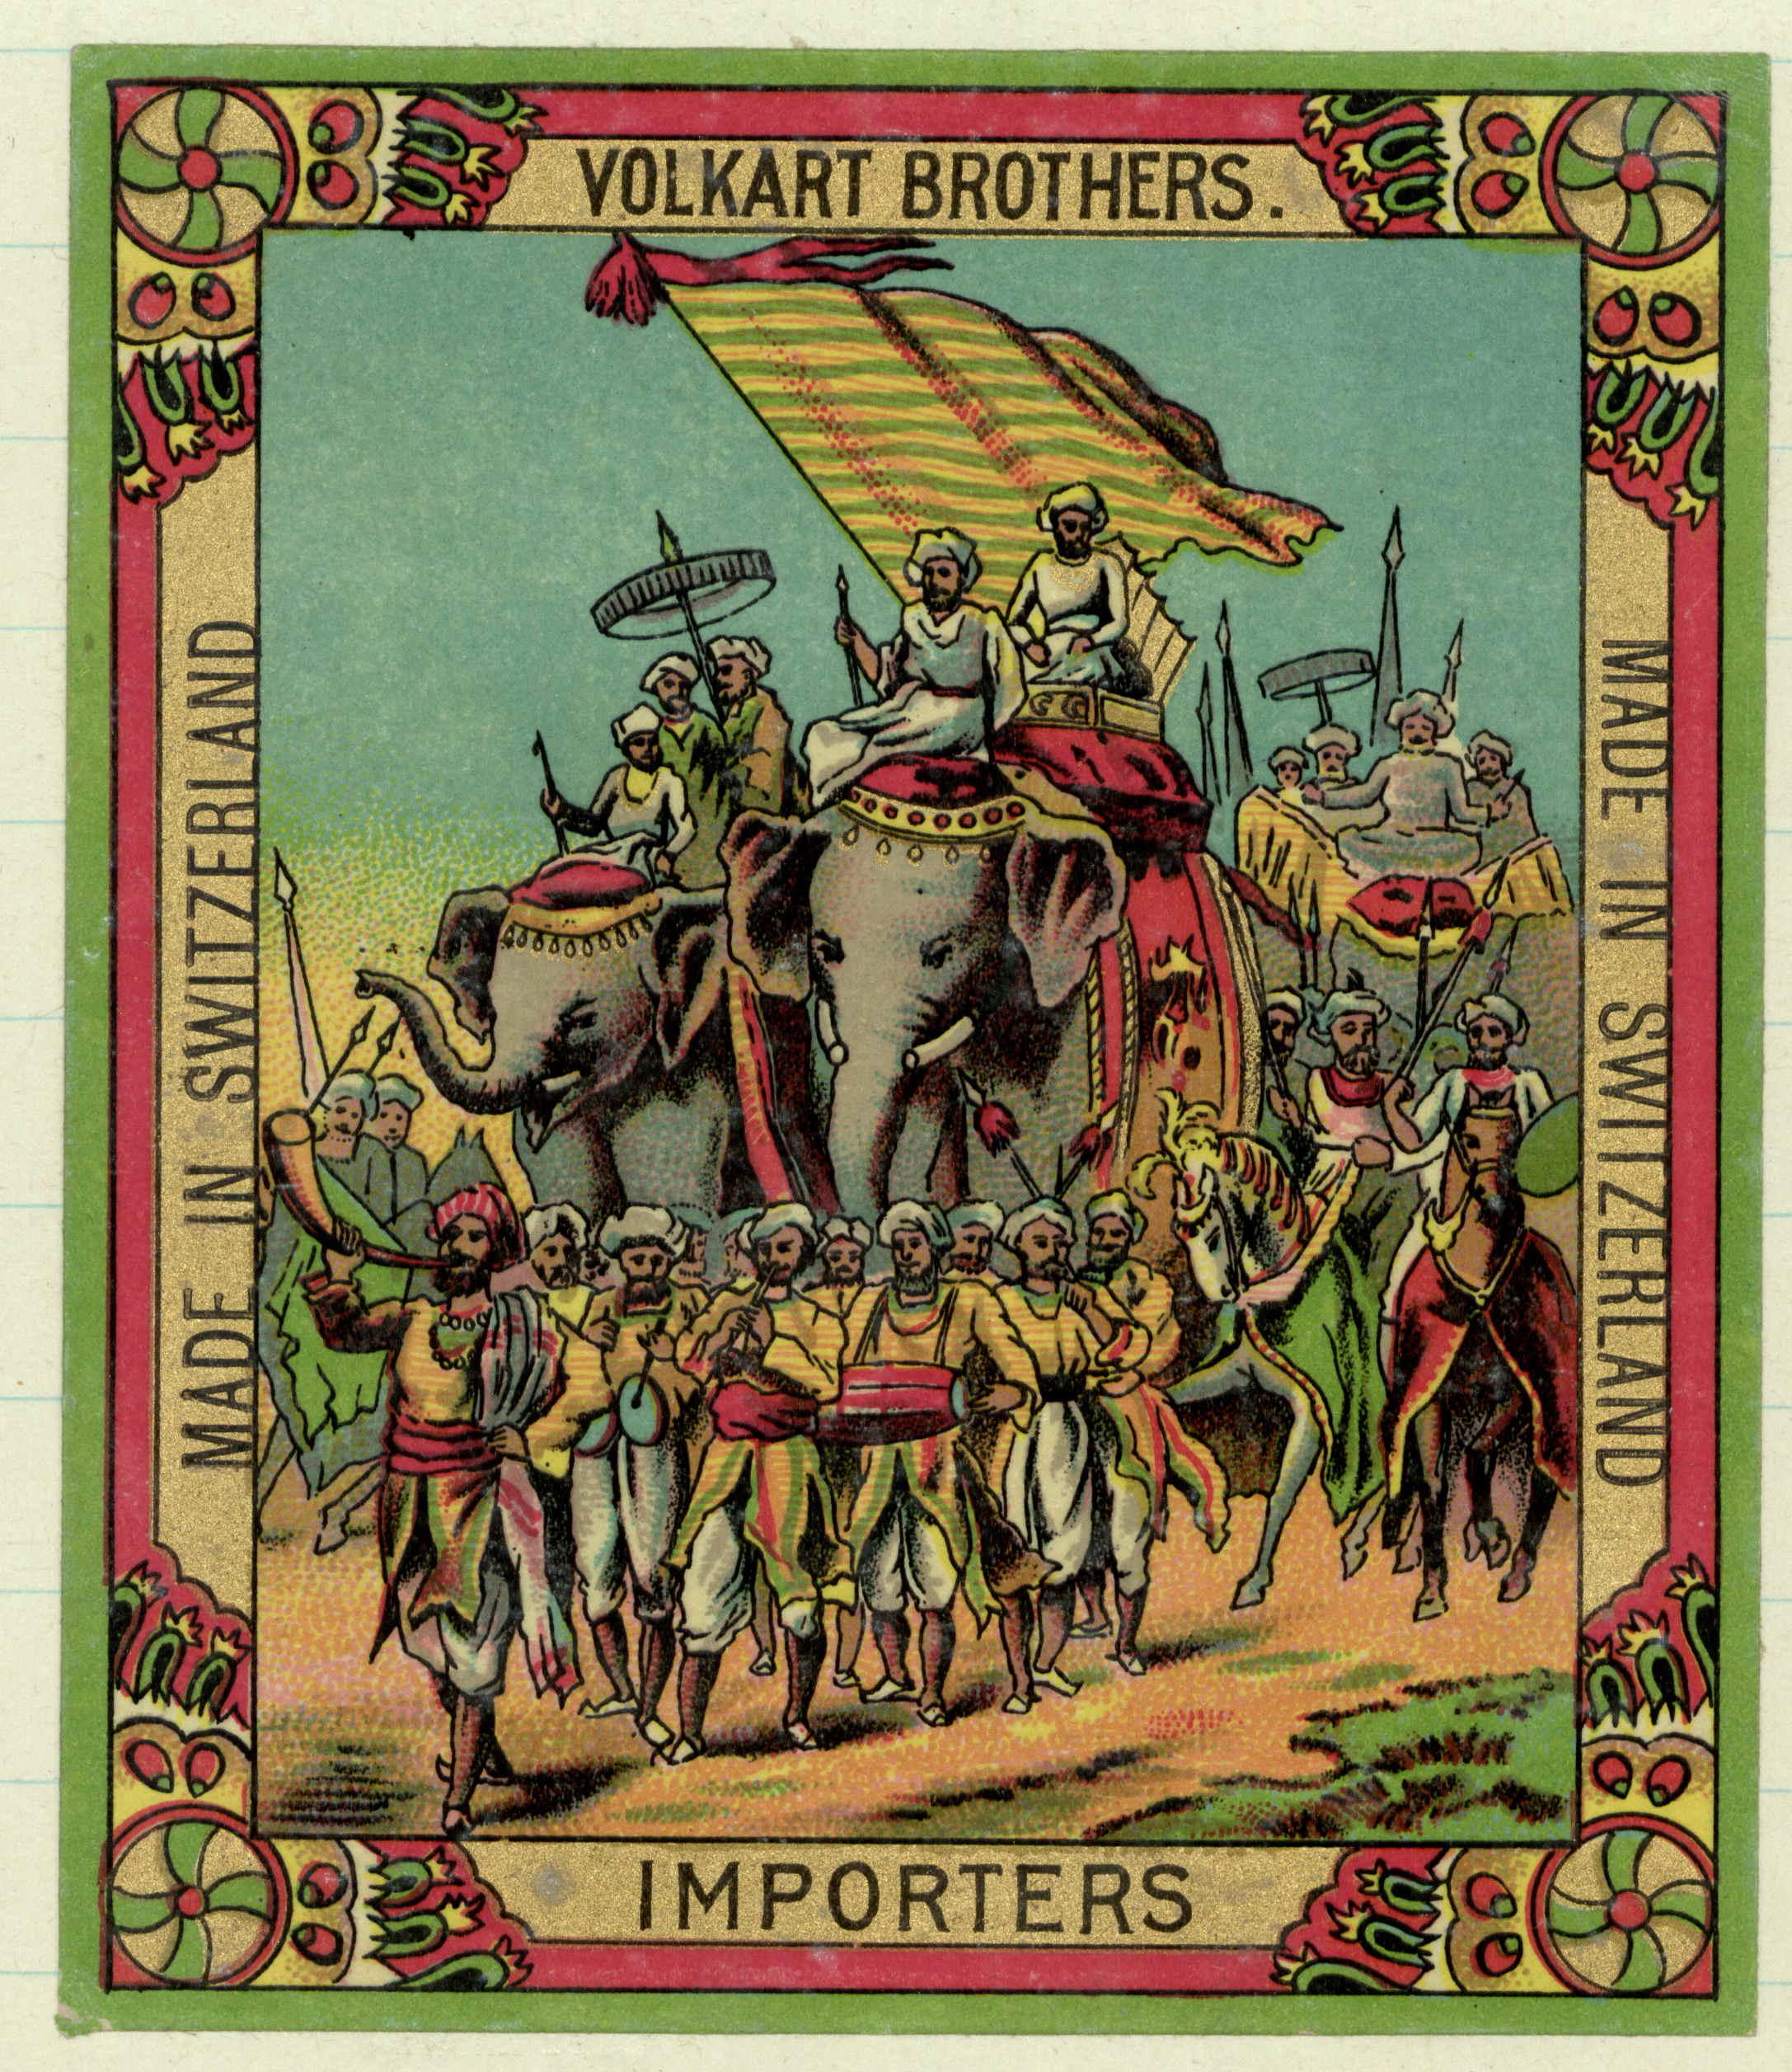 Volkart Brothers, label